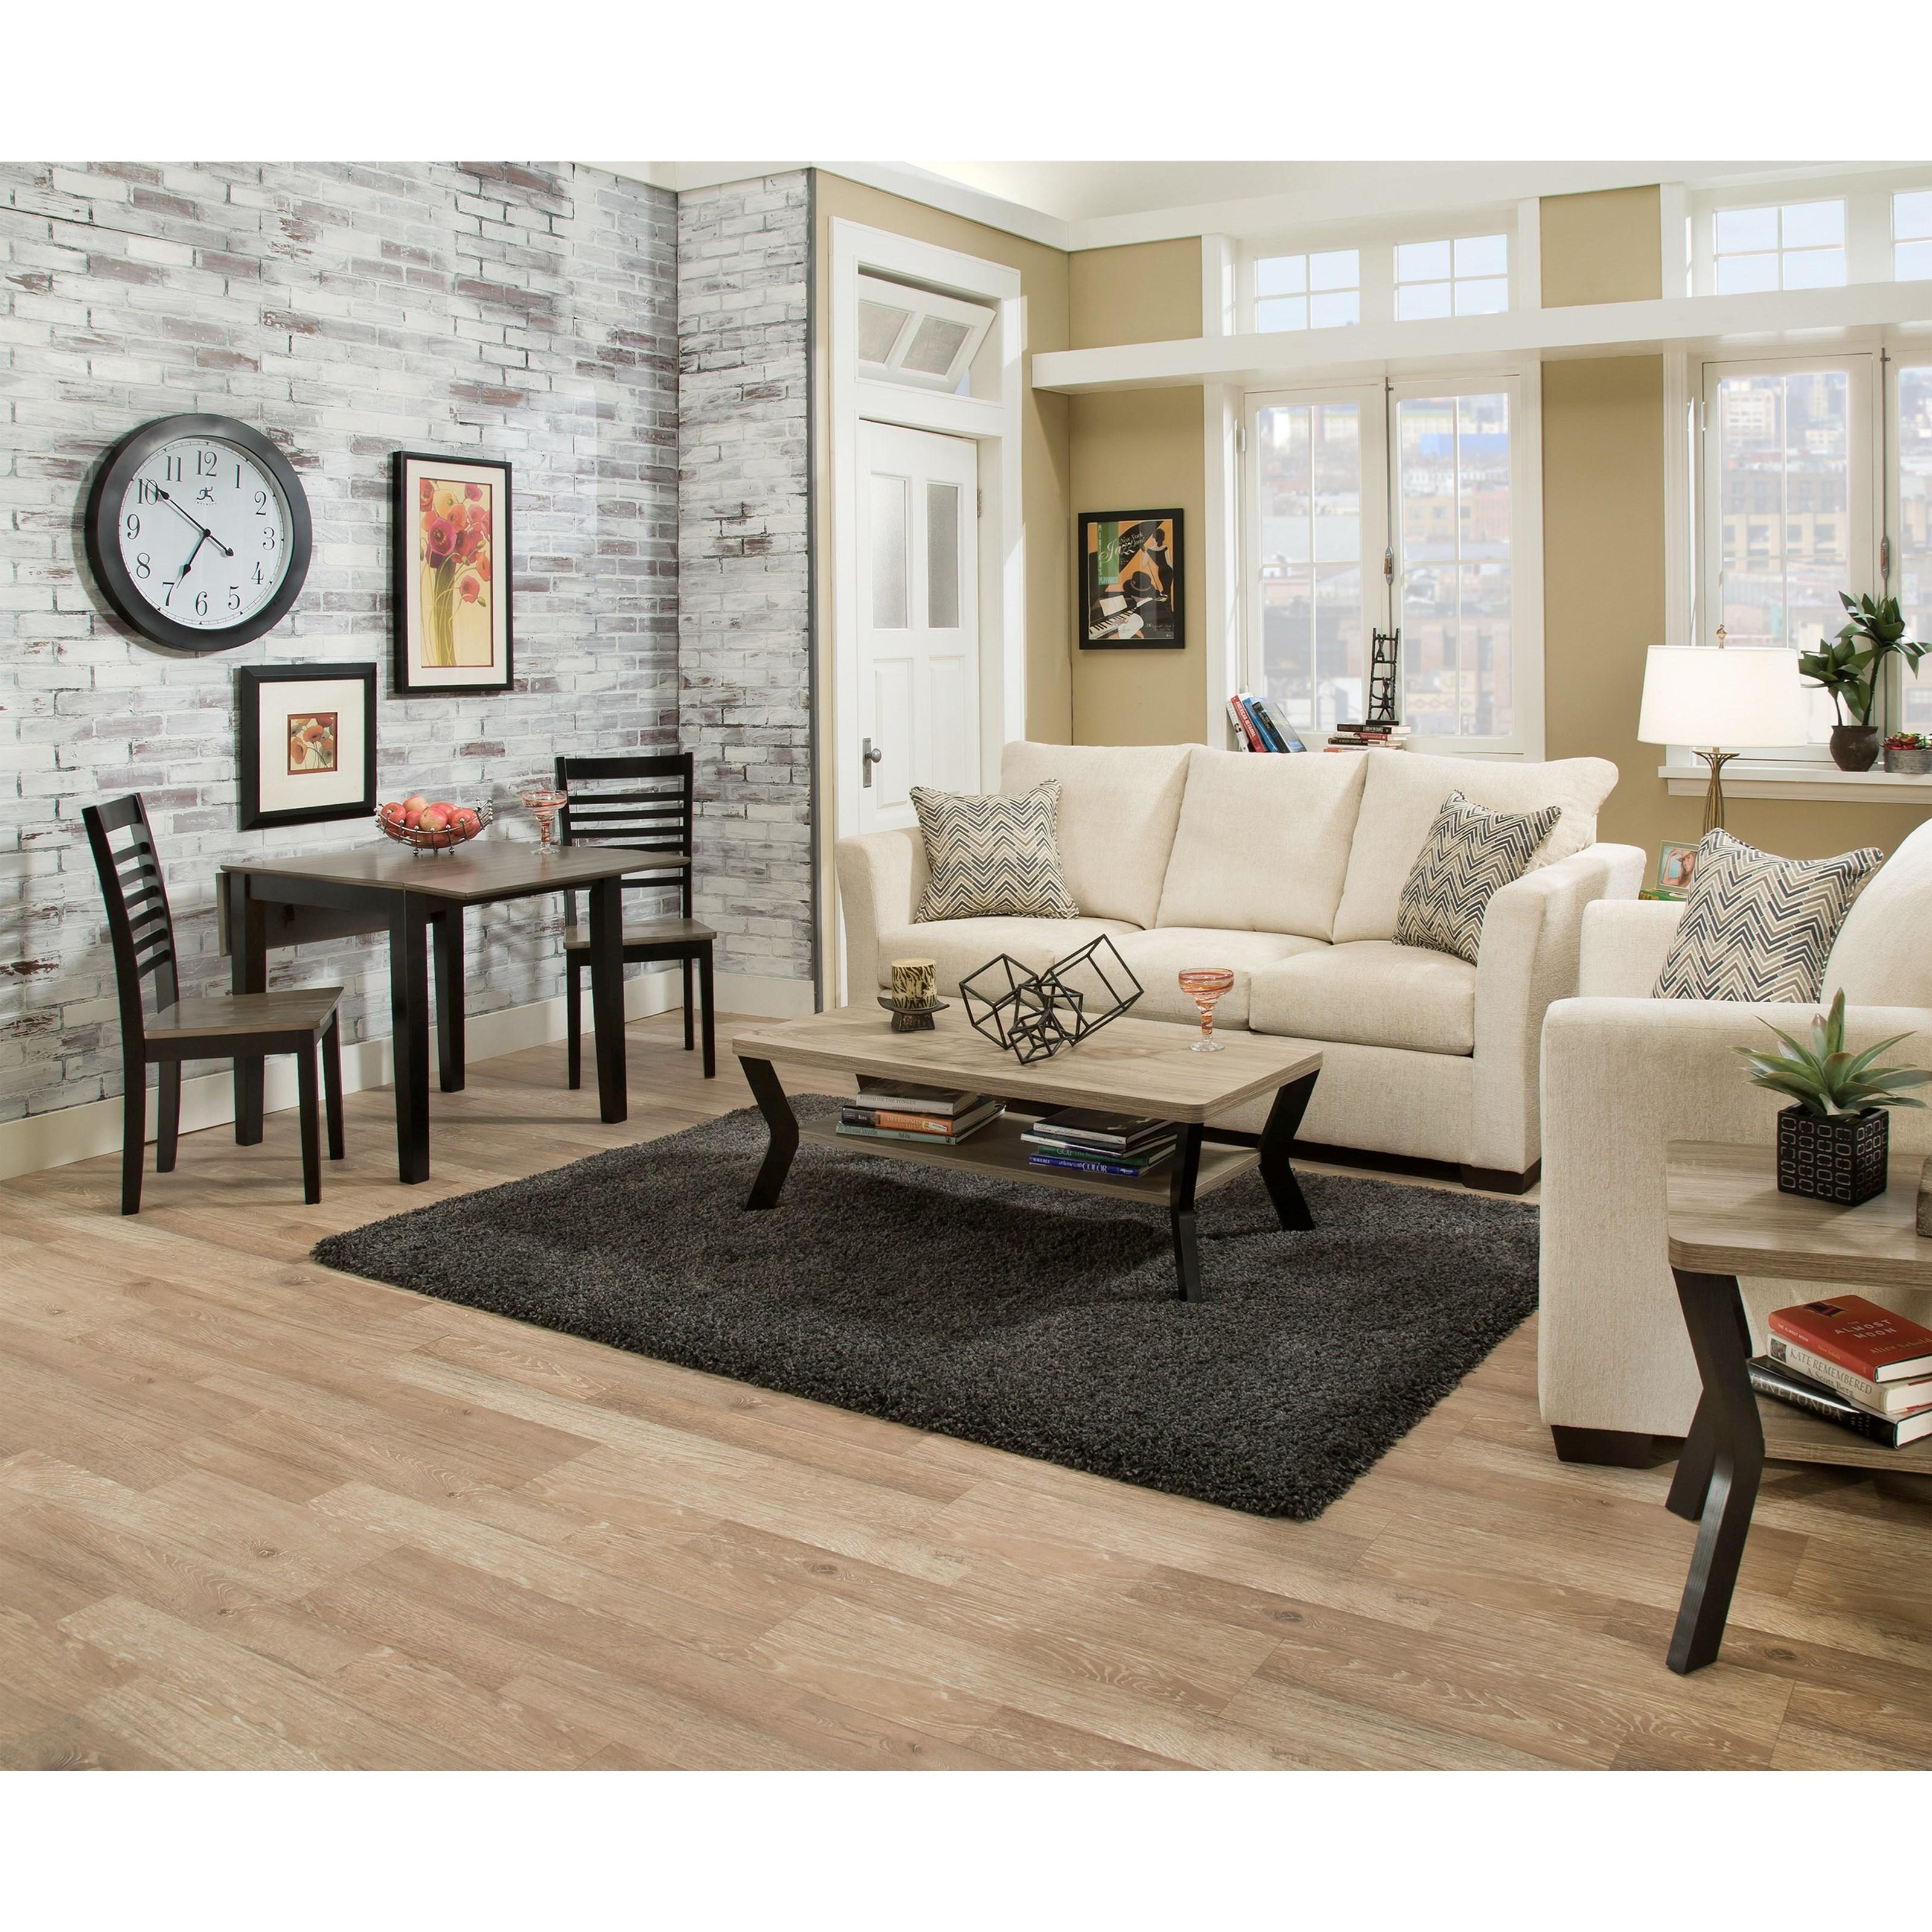 Leather Sofas Preston Lancashire: Simmons Upholstery 4206 4206-QSleeperSofa Transitional